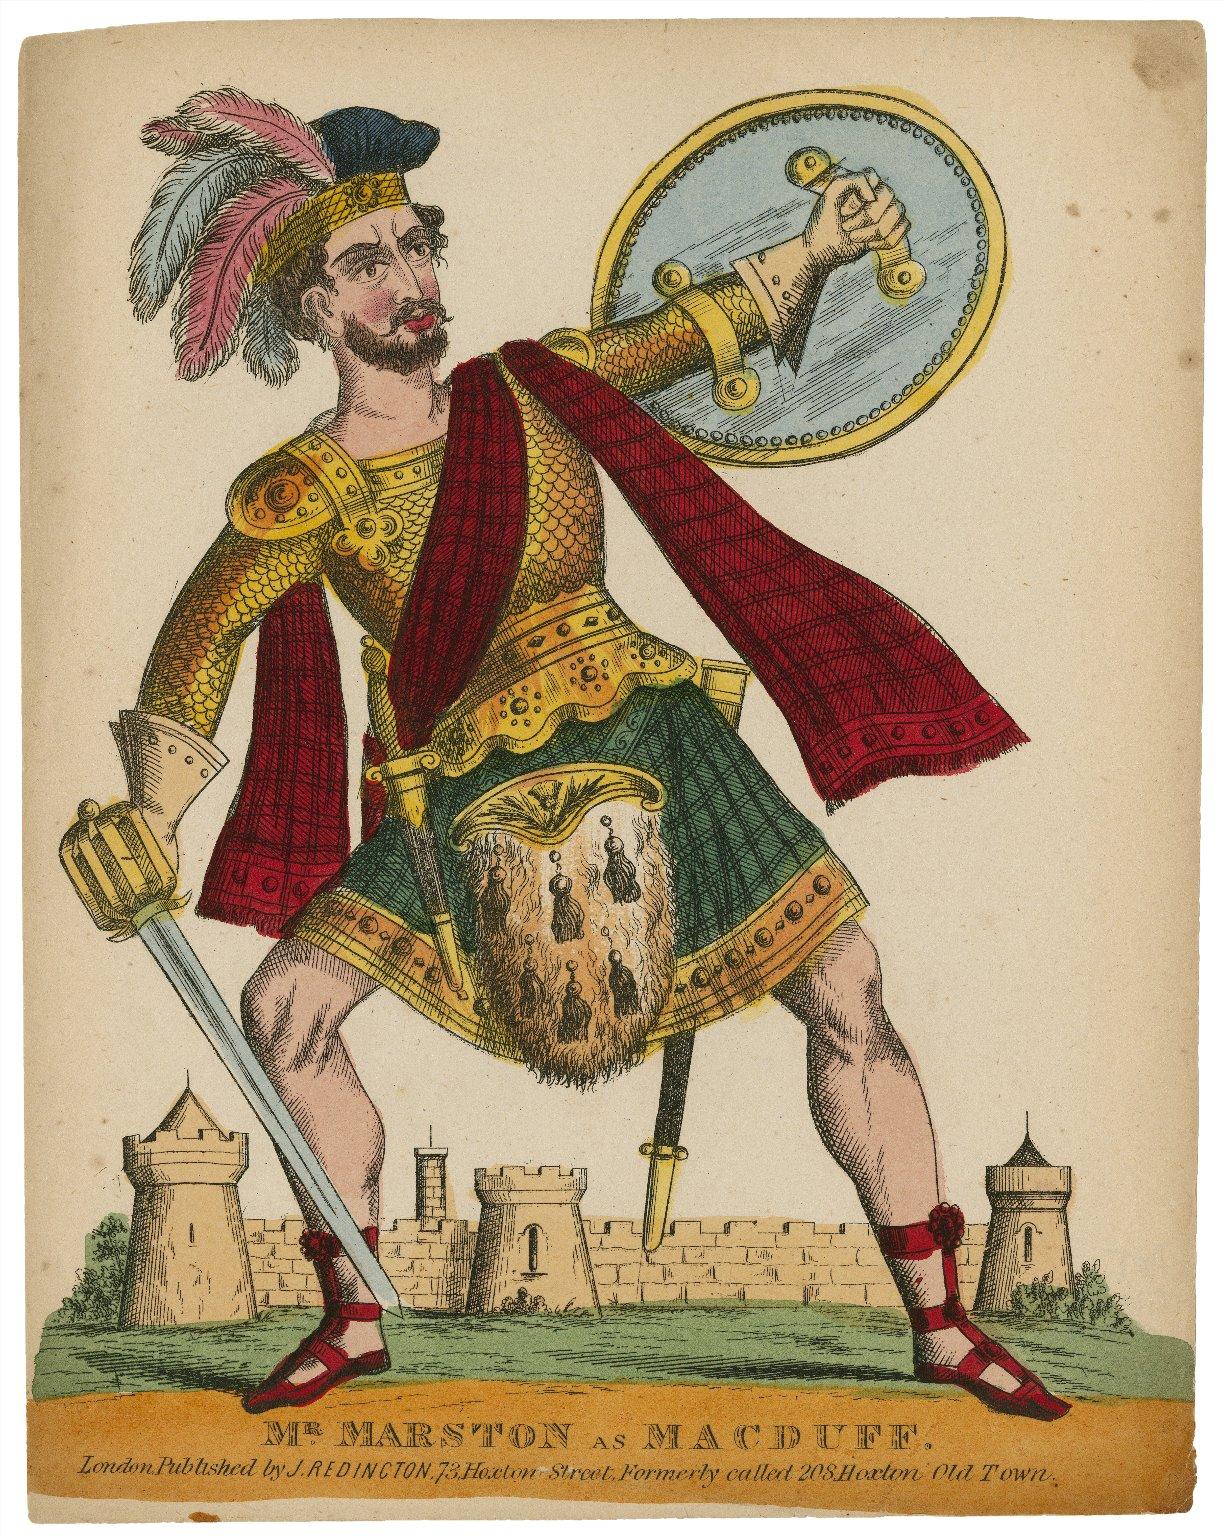 Mr. Marston as Macduff [graphic].